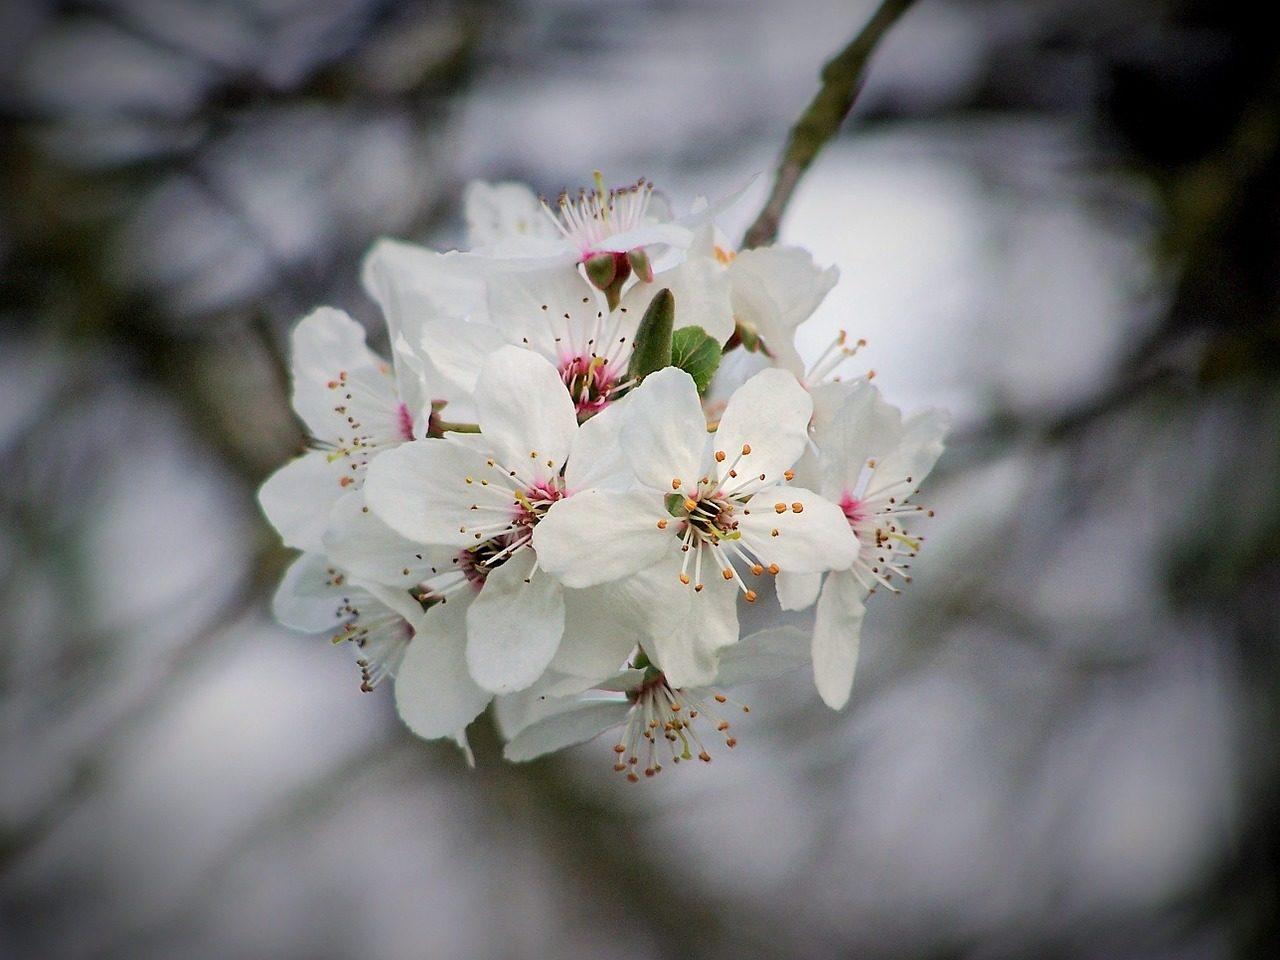 Bachblüten-Ungleichgewicht-Symptome